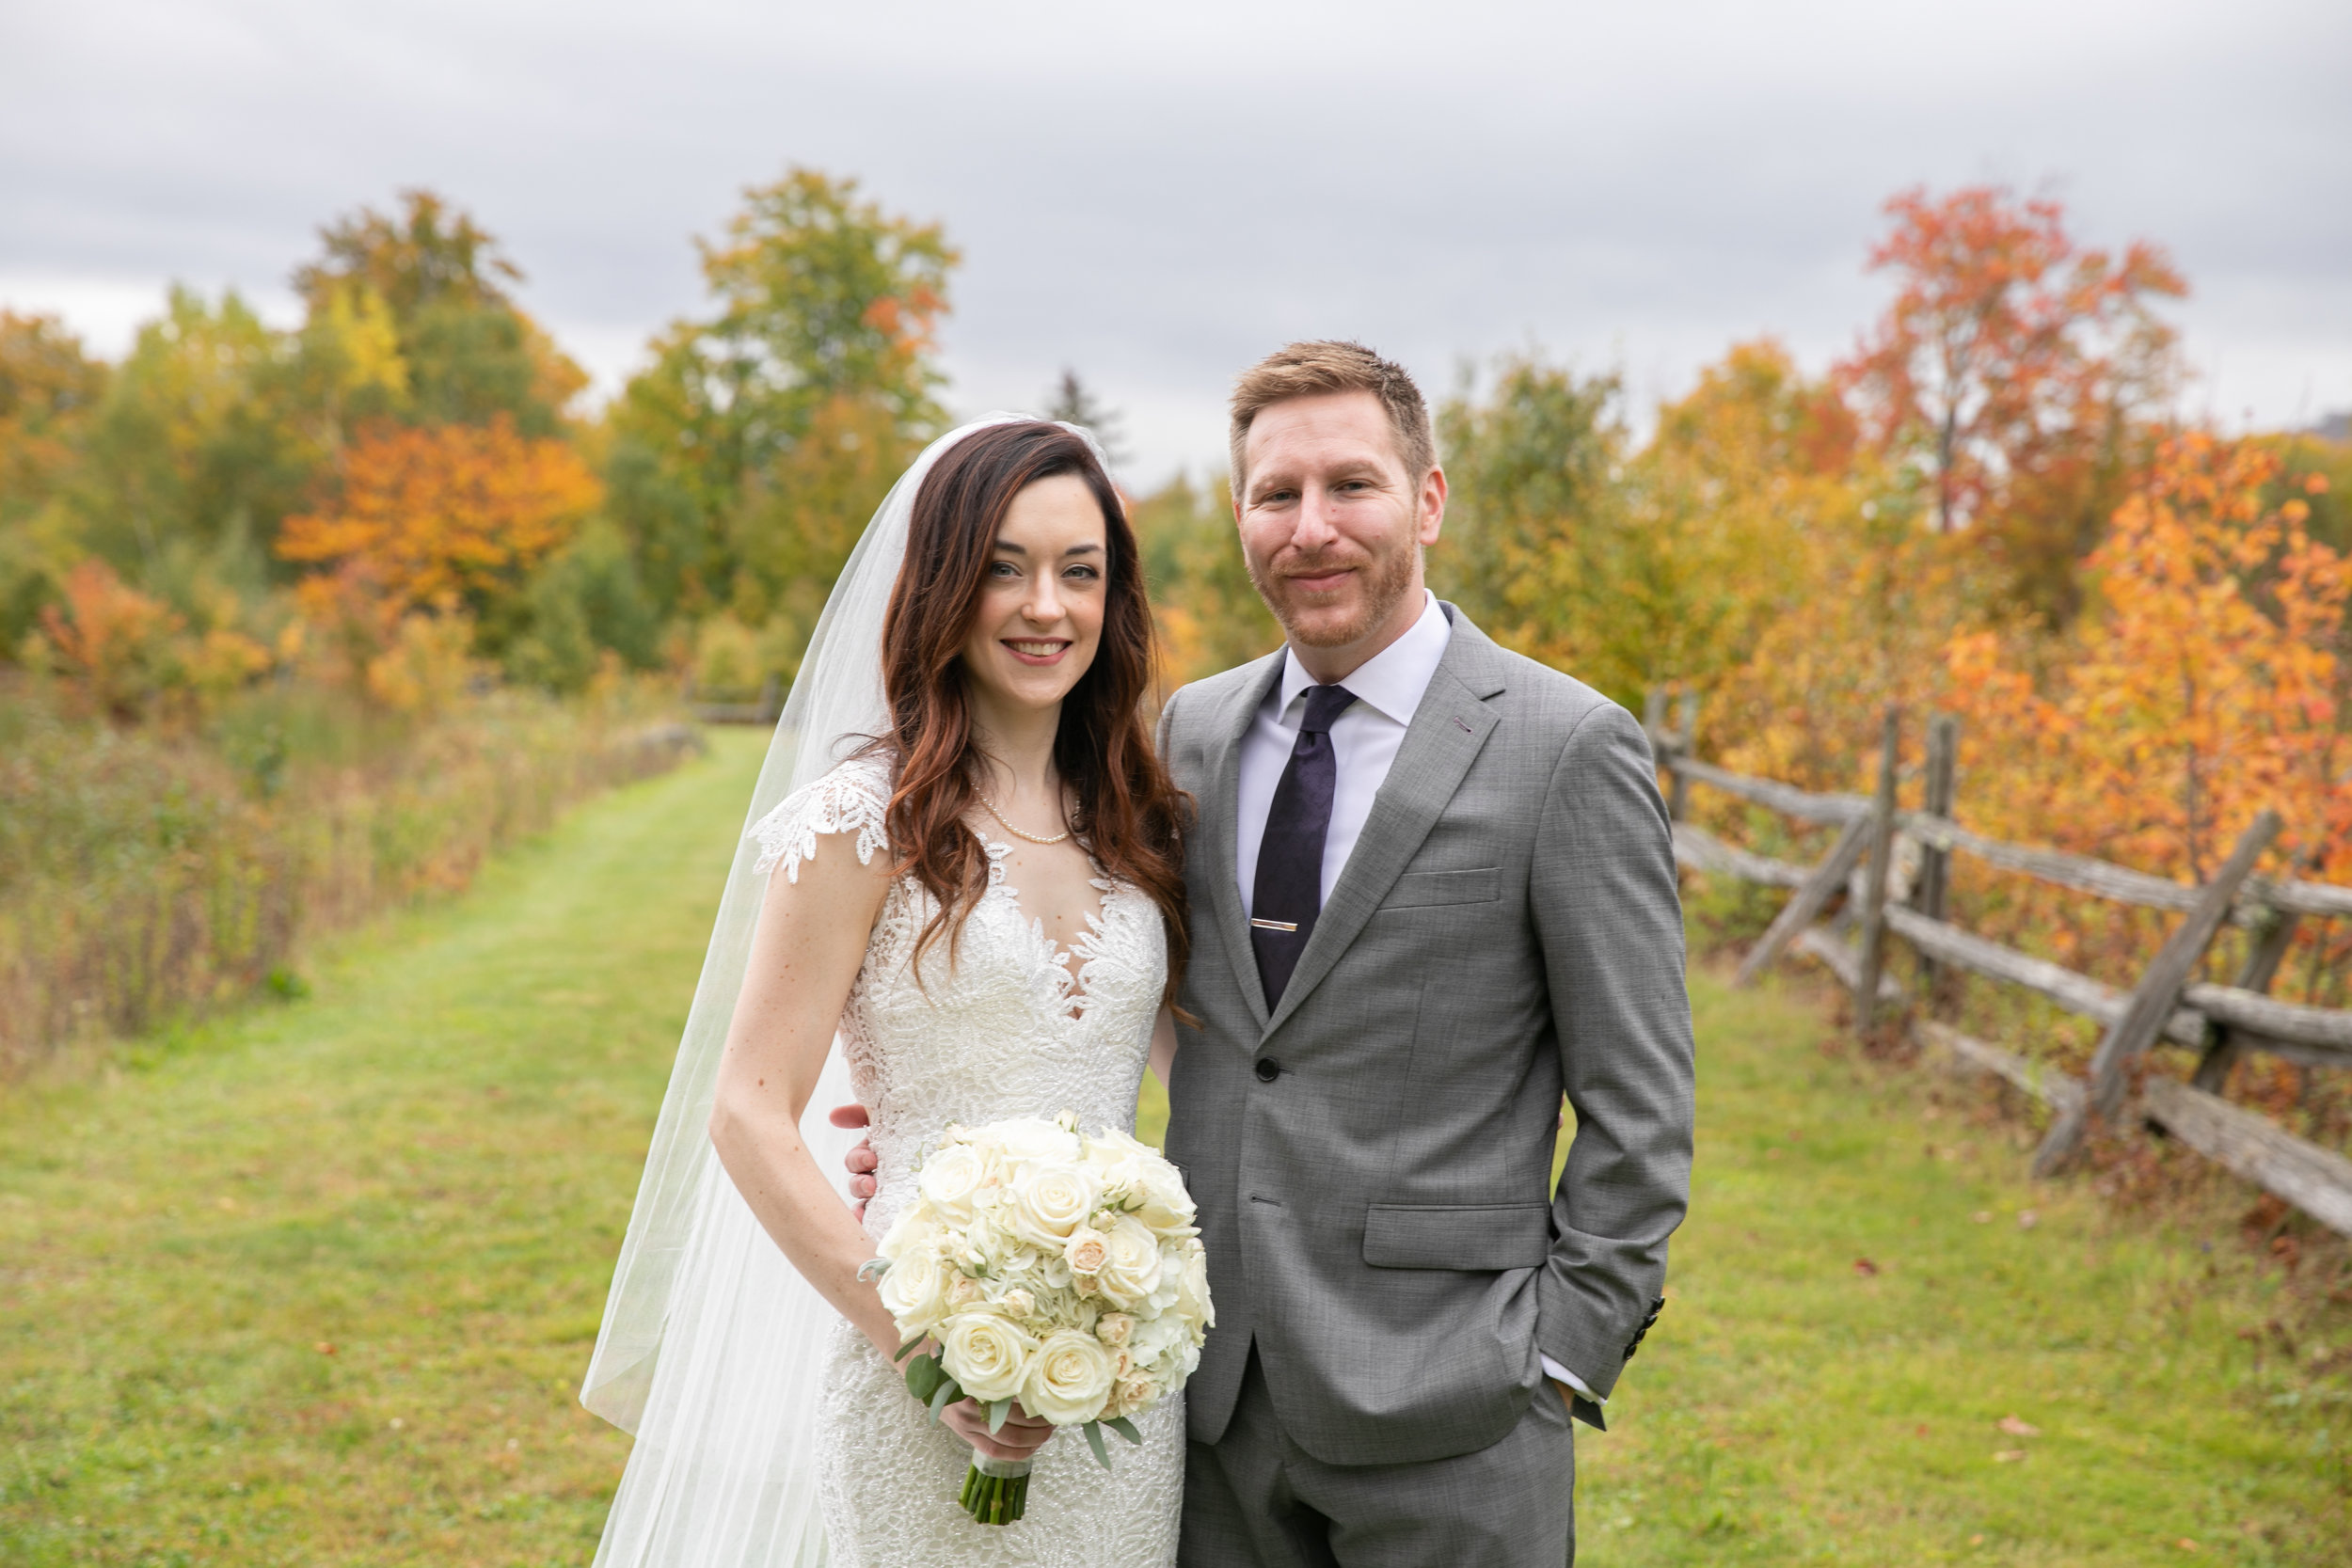 Erin & Adam - October 6, 2018 @  The Ponds at Bolton Valley  - Richmond, Vermont